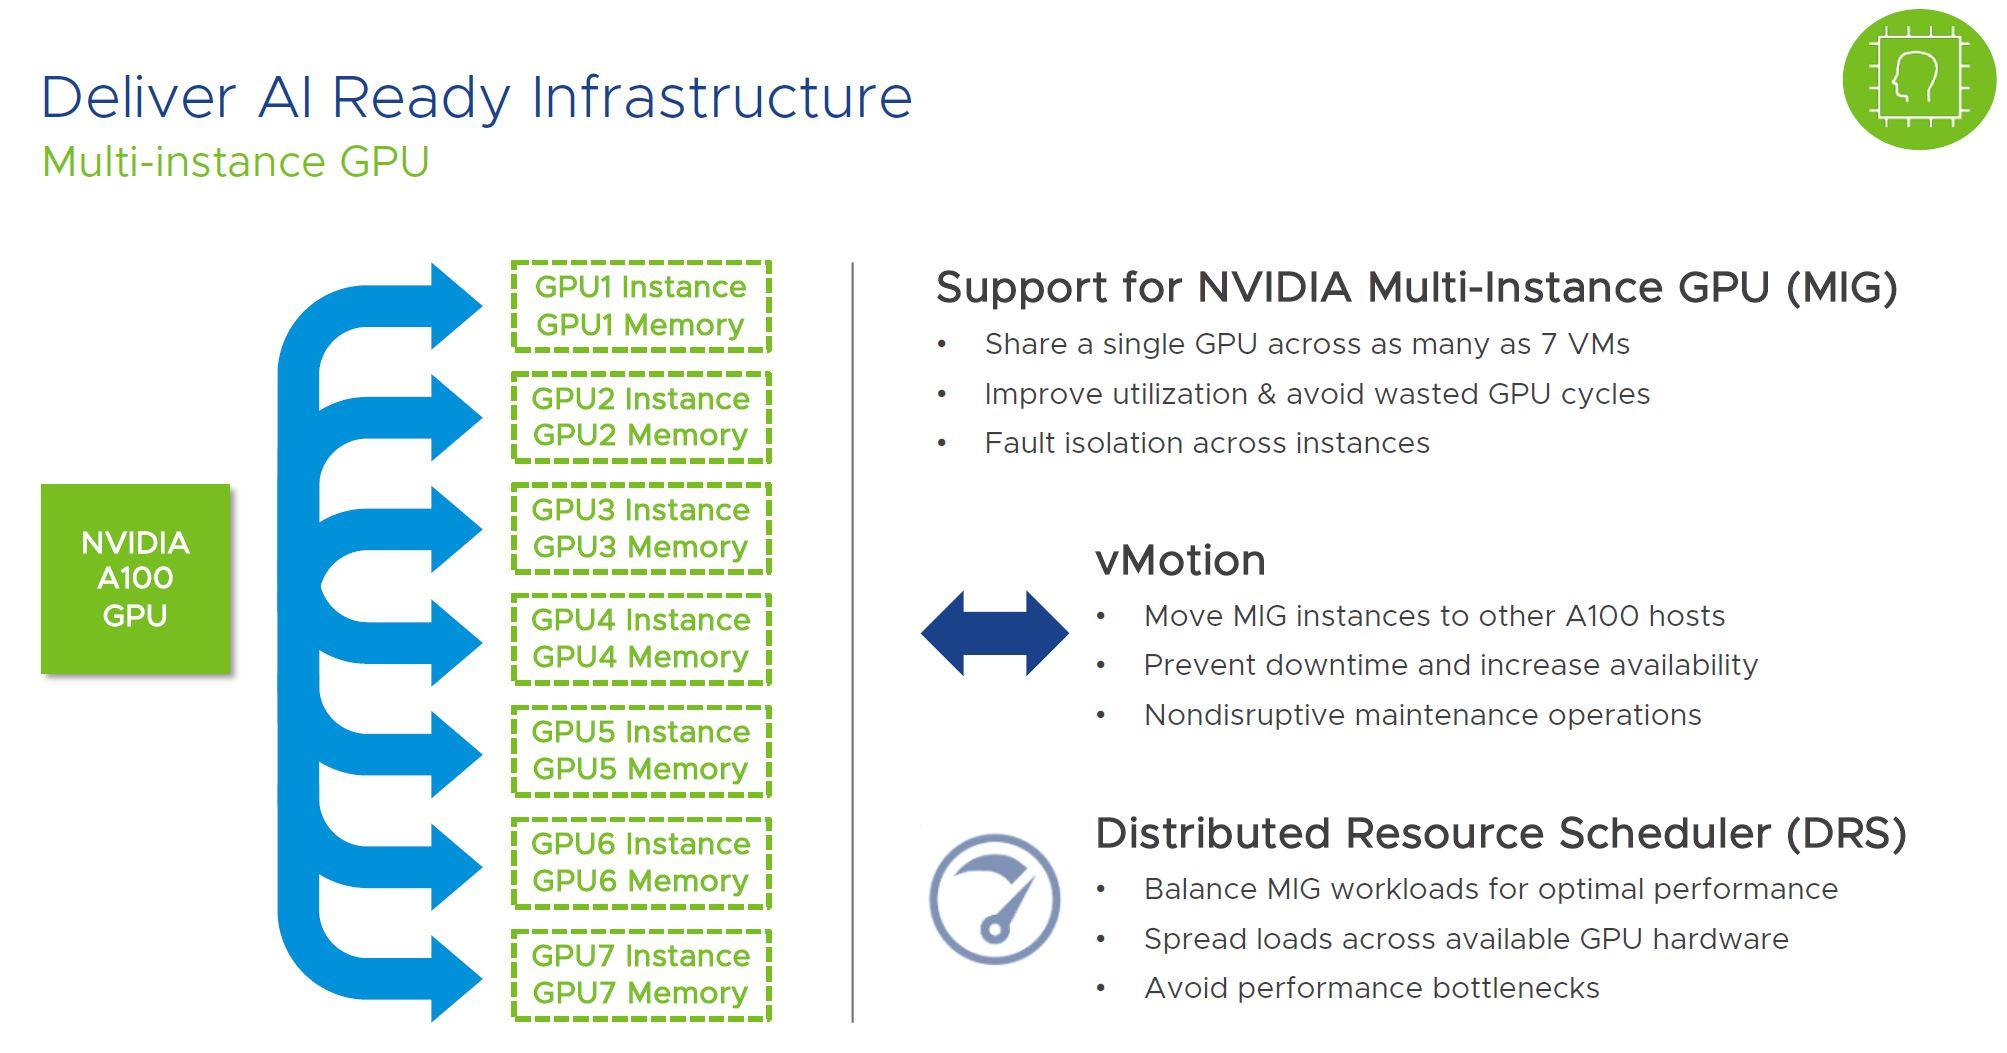 VMware VSphere NVIDIA A100 MIG Support